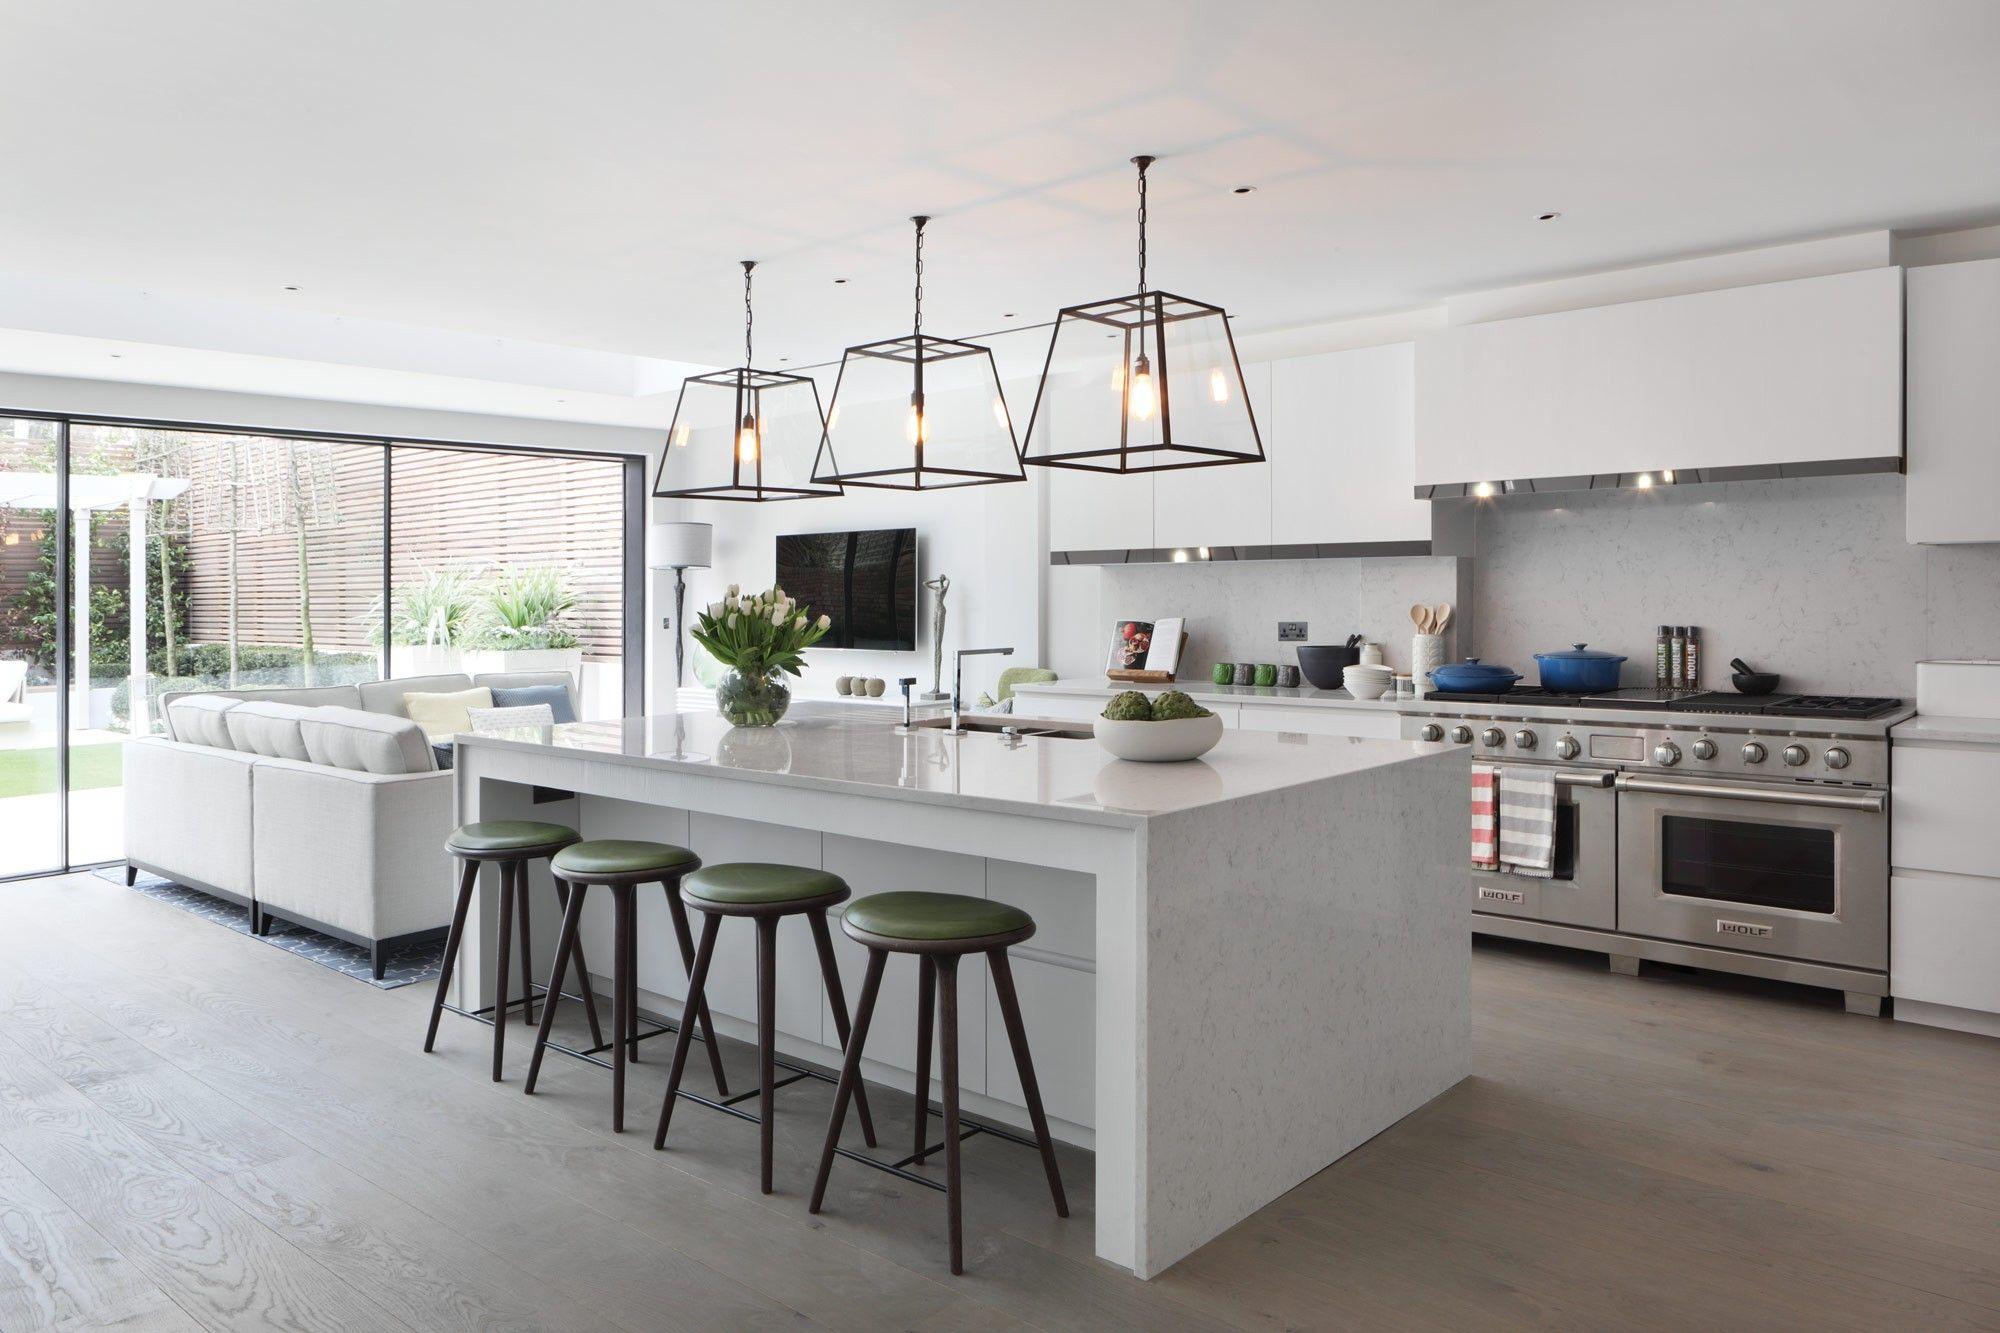 Kensington grey oak engineered flooring looks great in this open ...